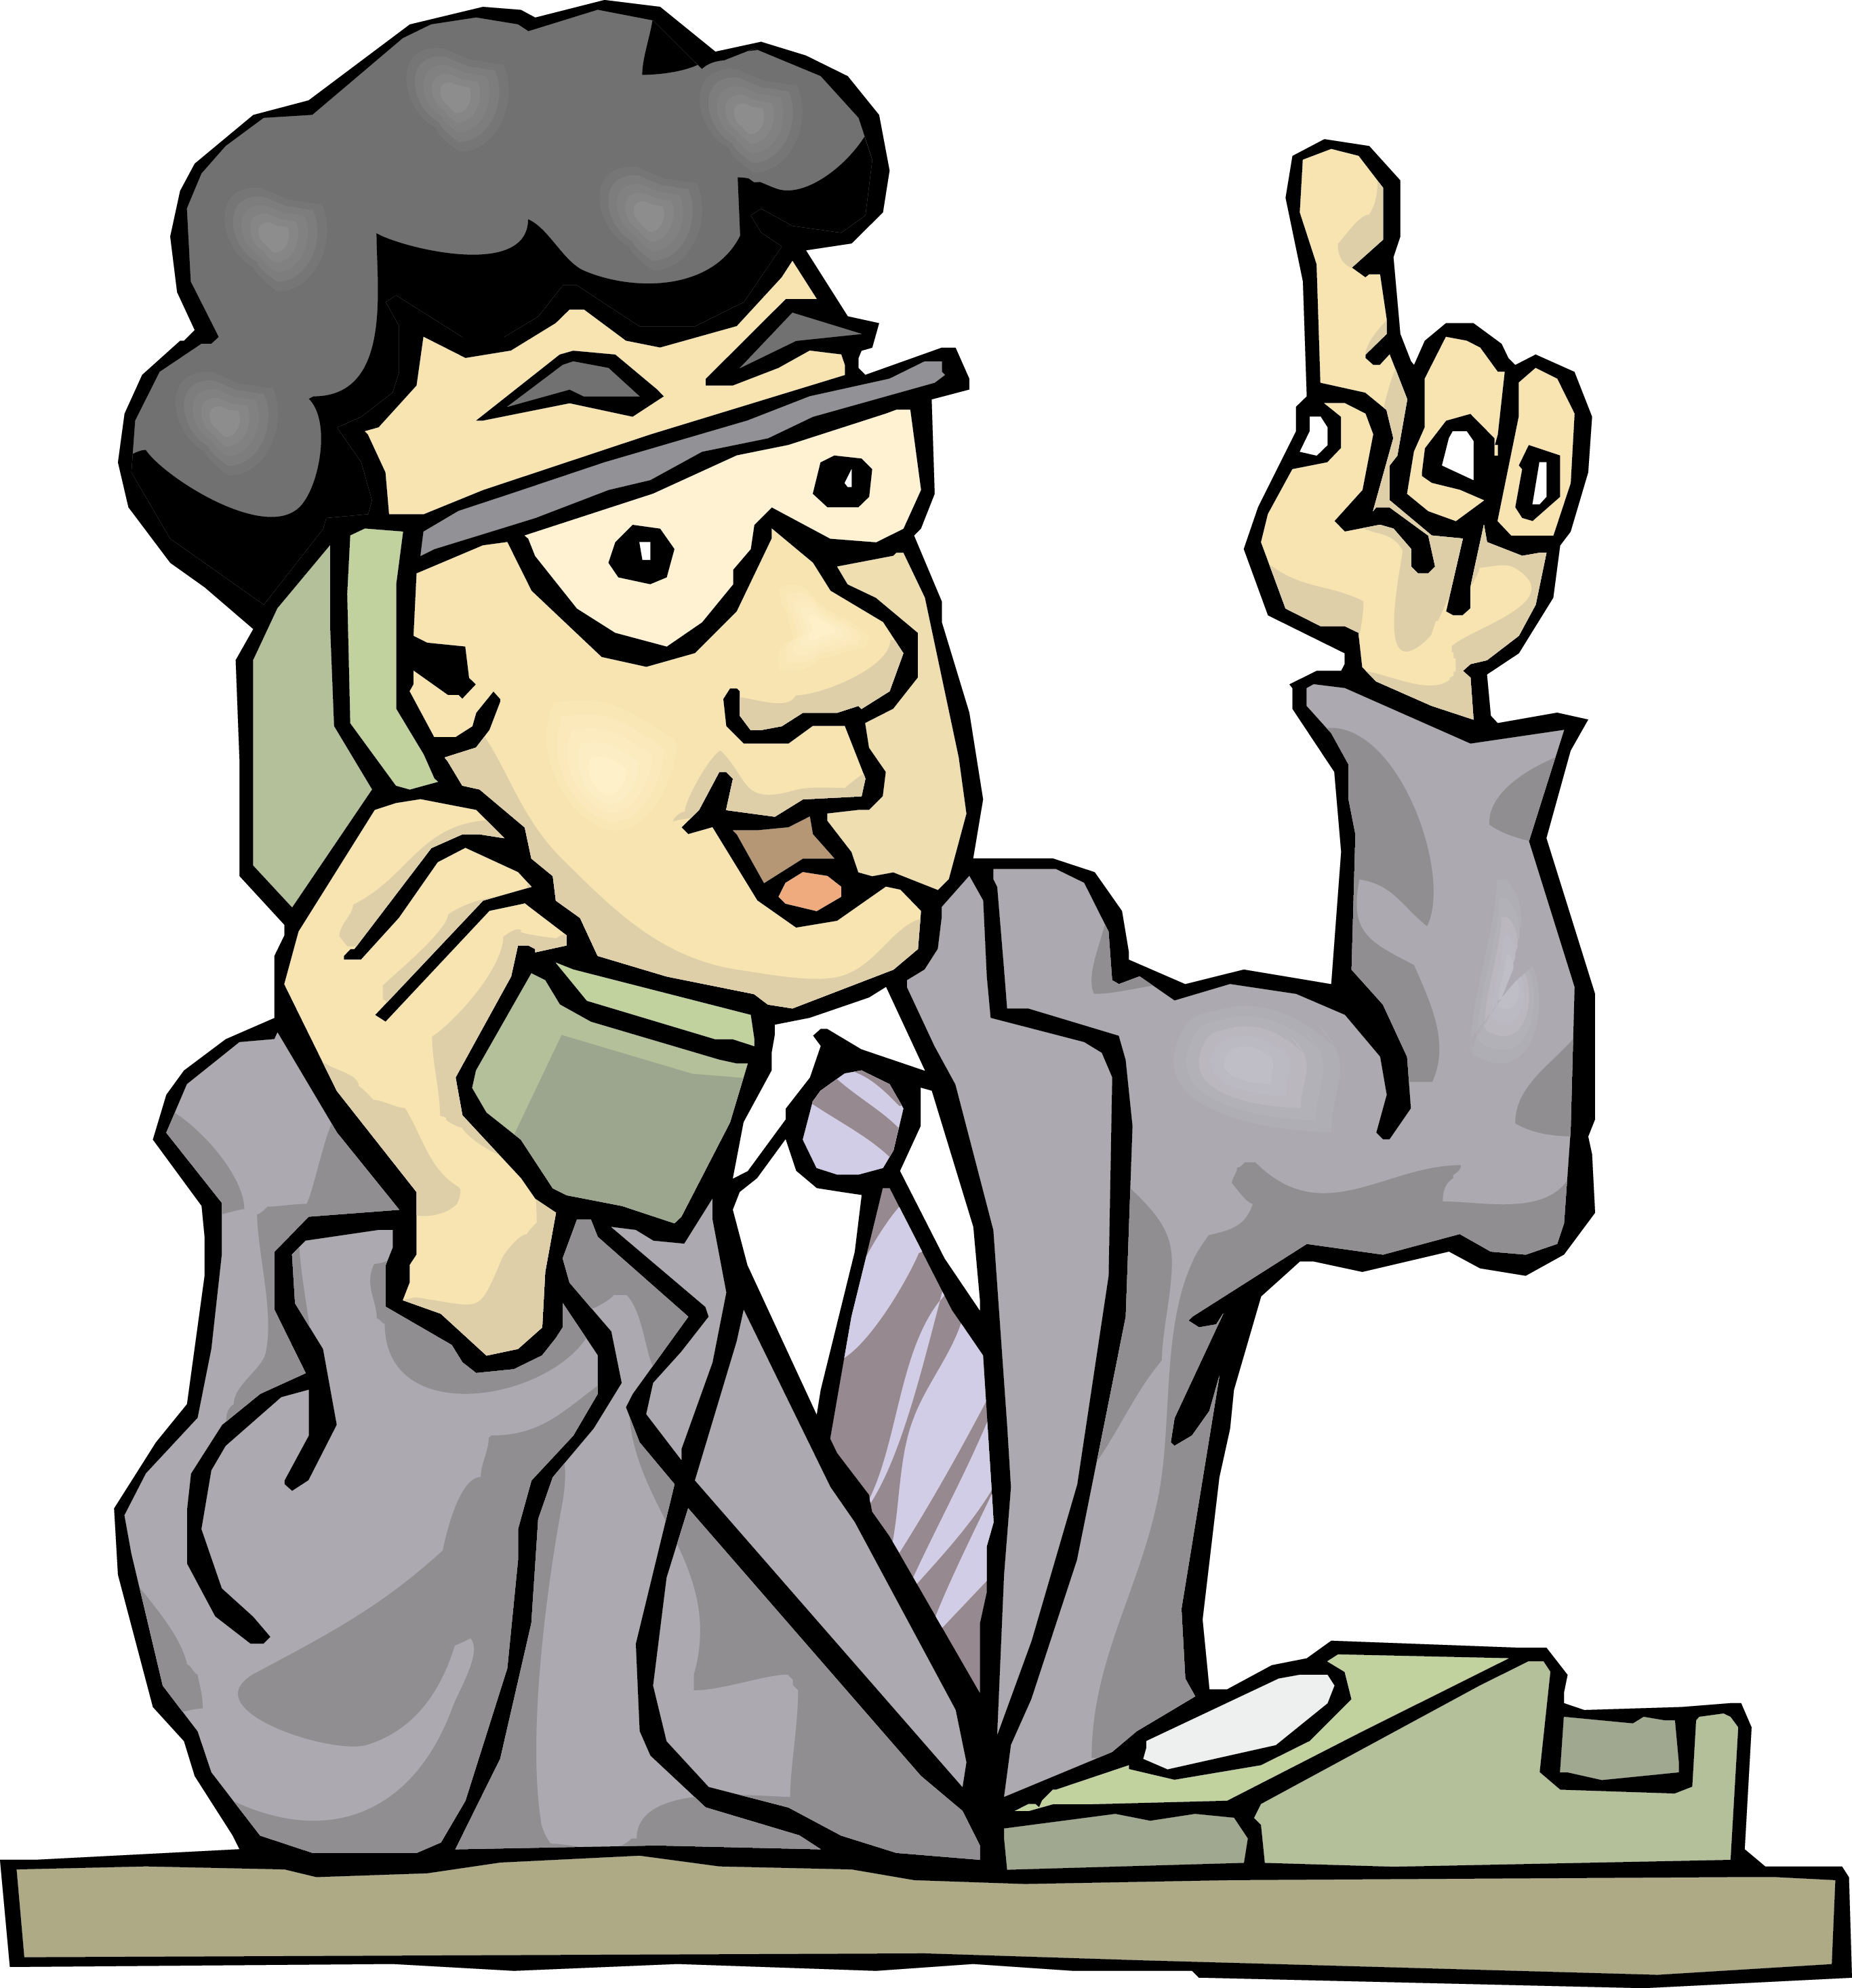 Telephone clipart answer phone, Telephone answer phone.